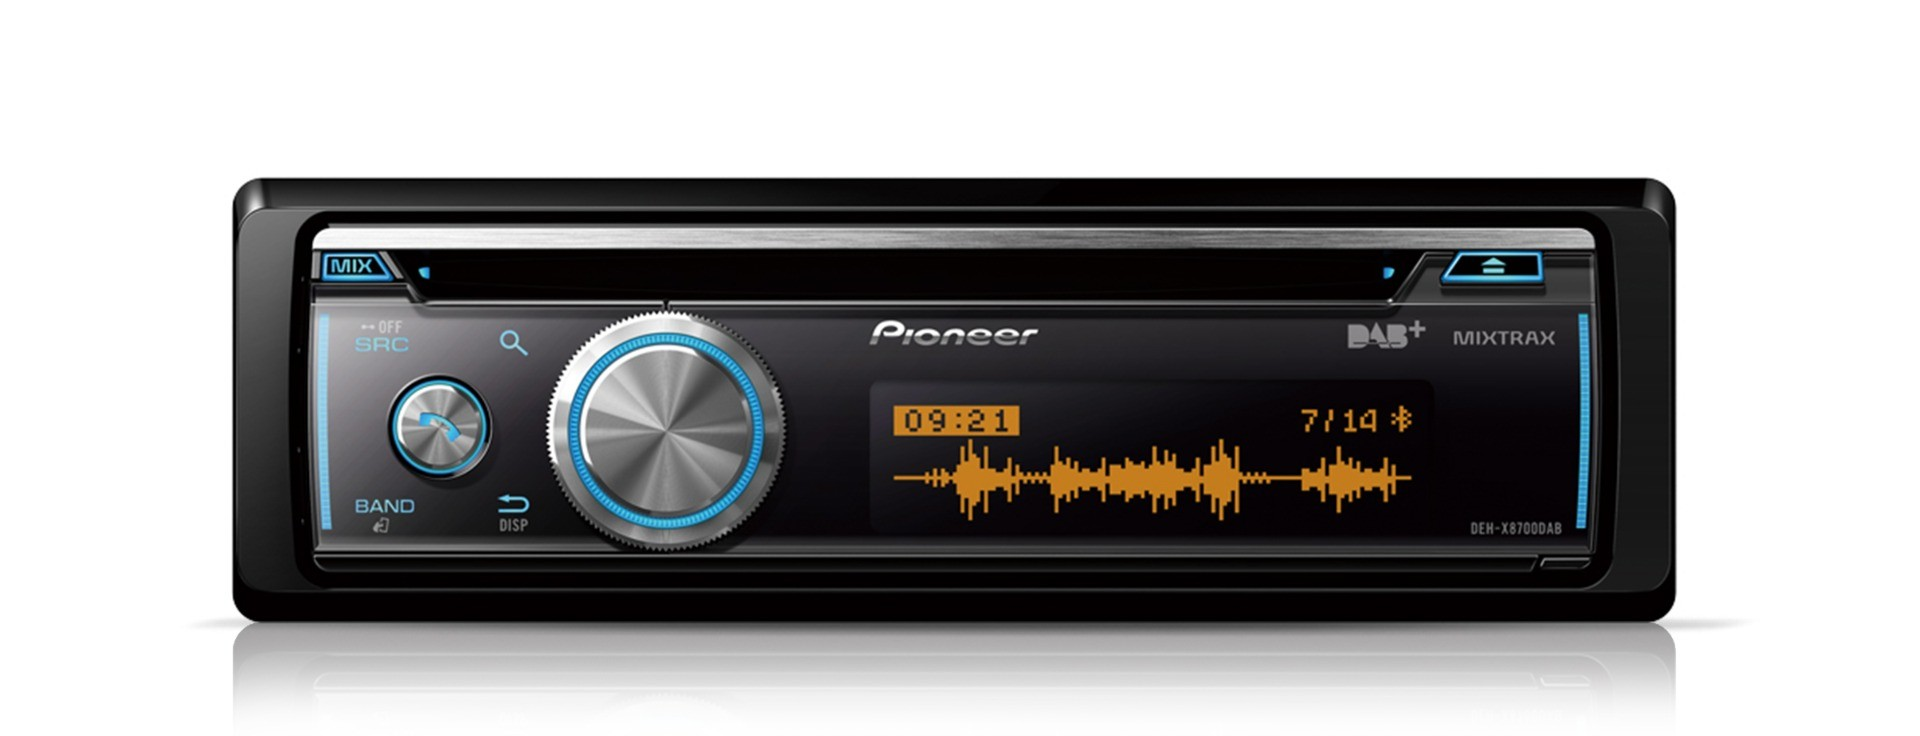 Pioneer DEH-X8700DAB 1DIN DAB/CD/USB/BT/AUX